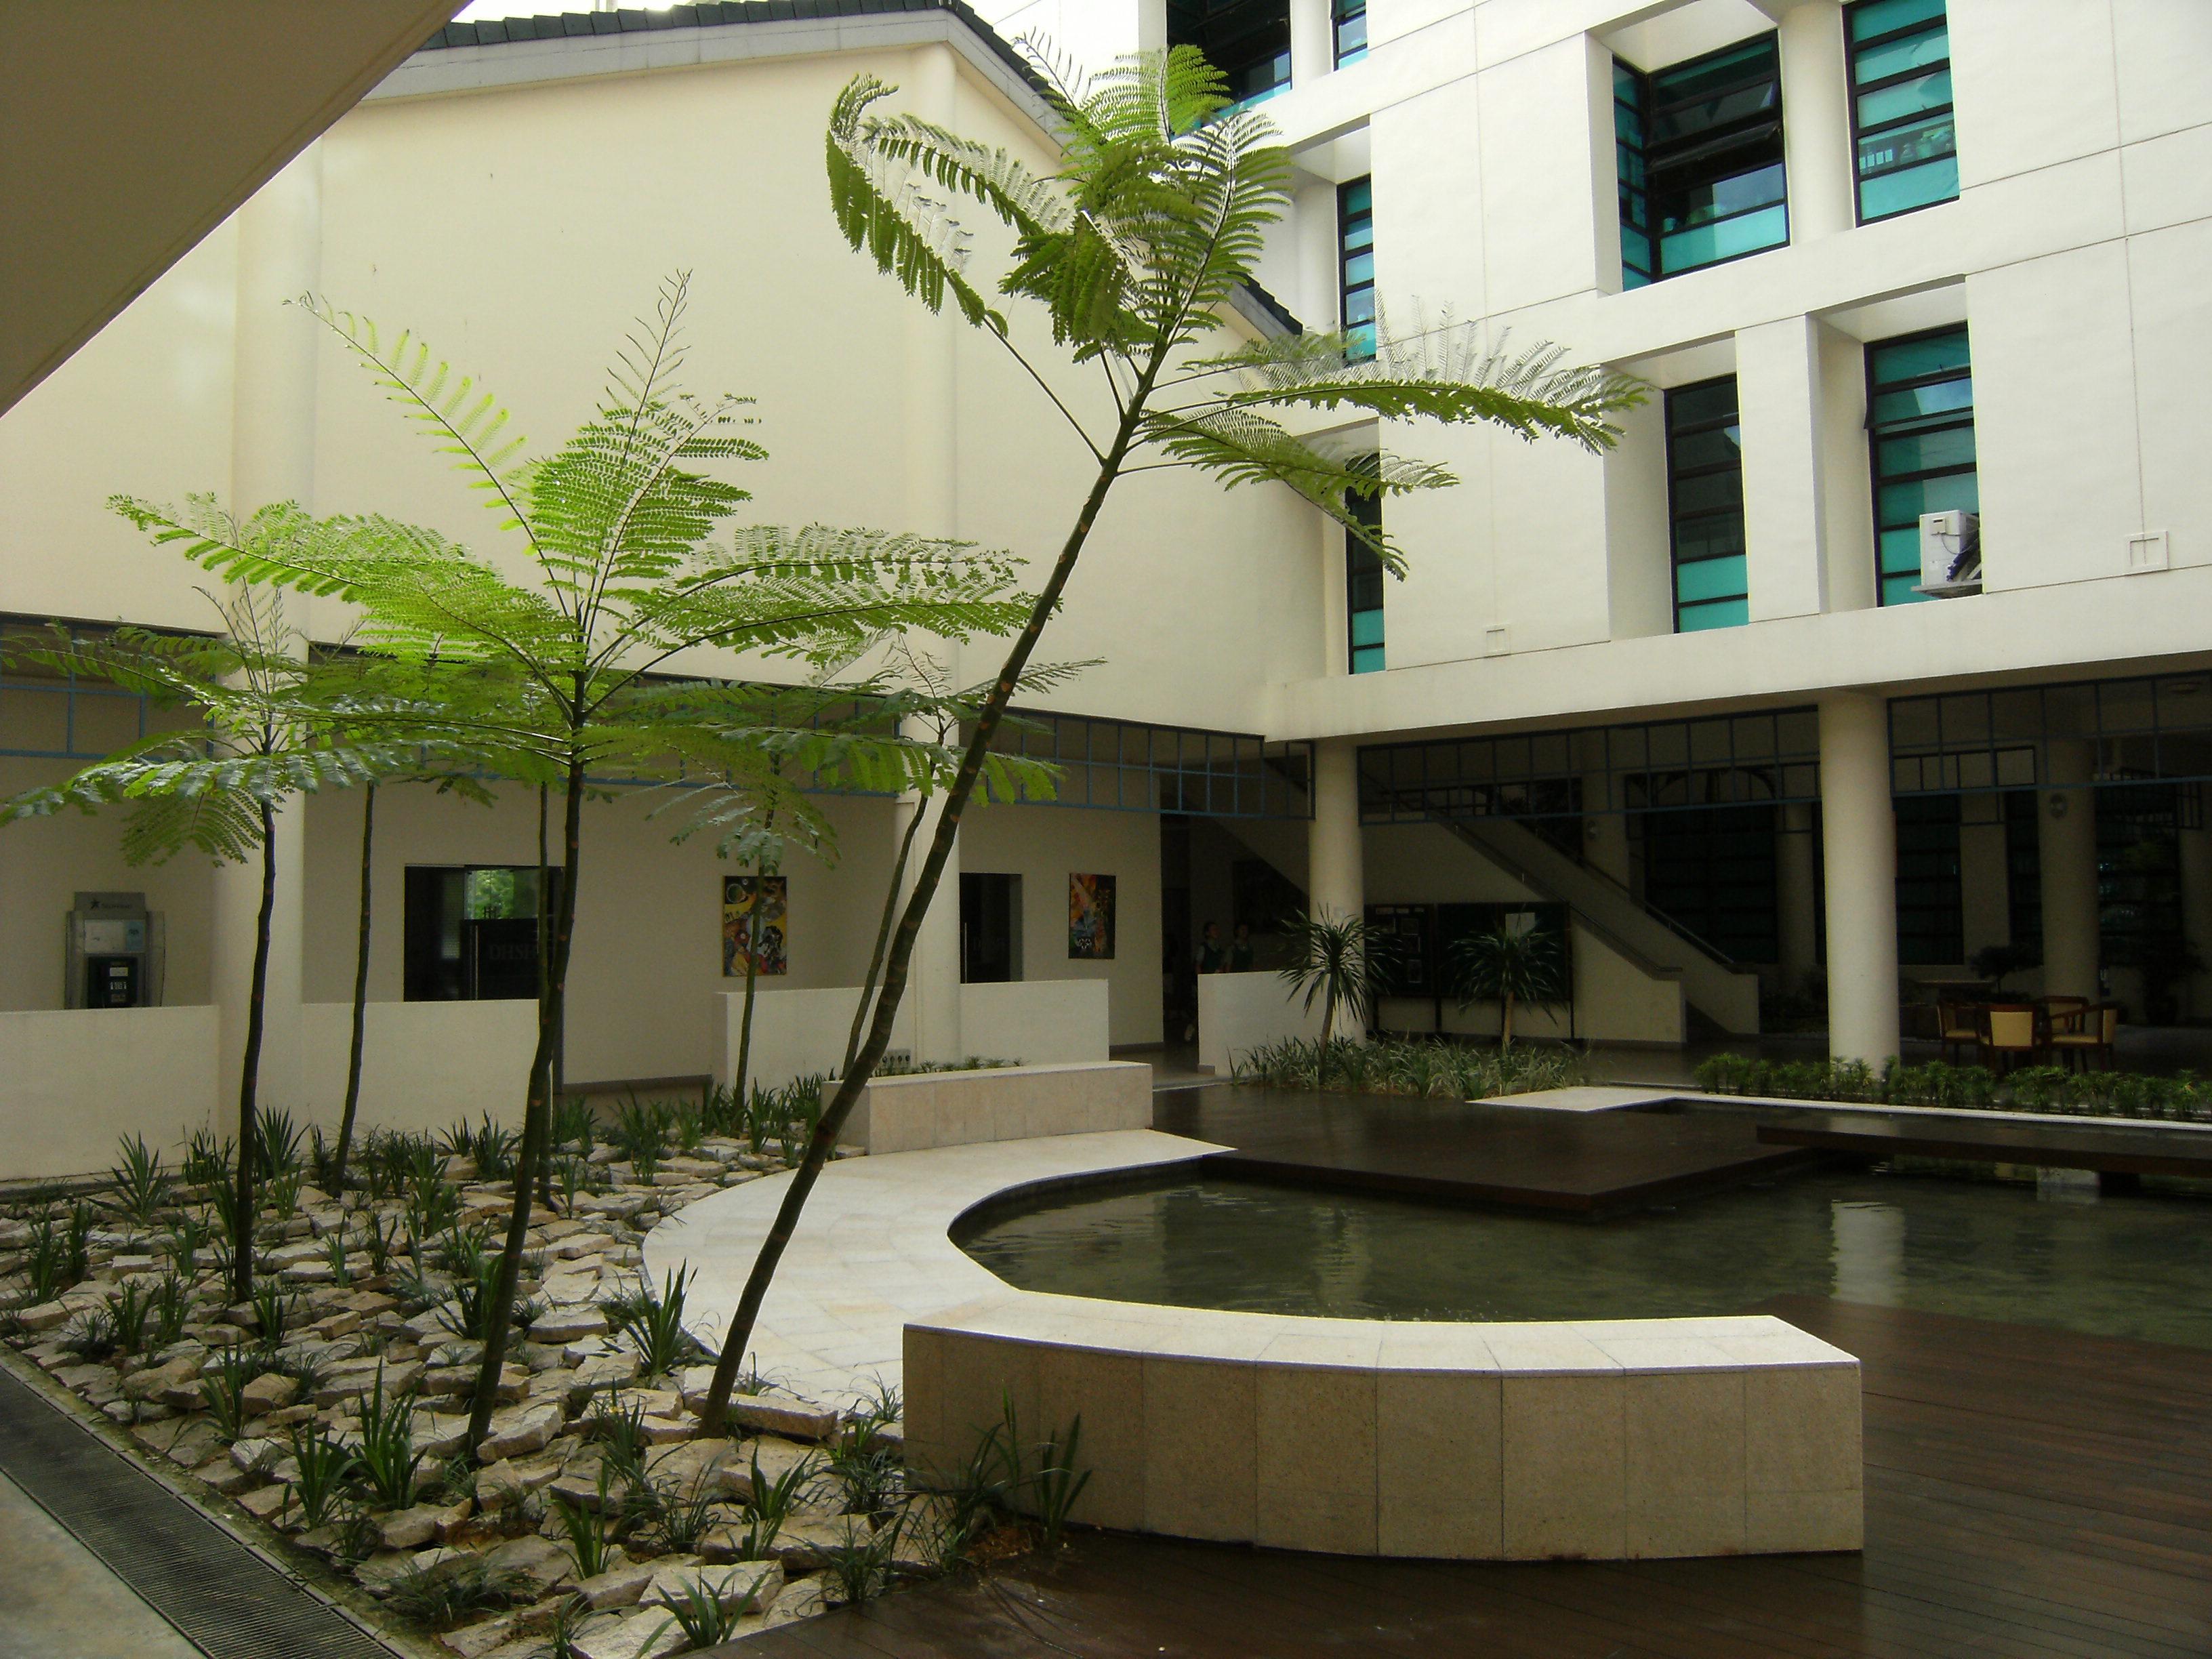 LW @ Duman High School Hostel | Greenhouse Design & Build